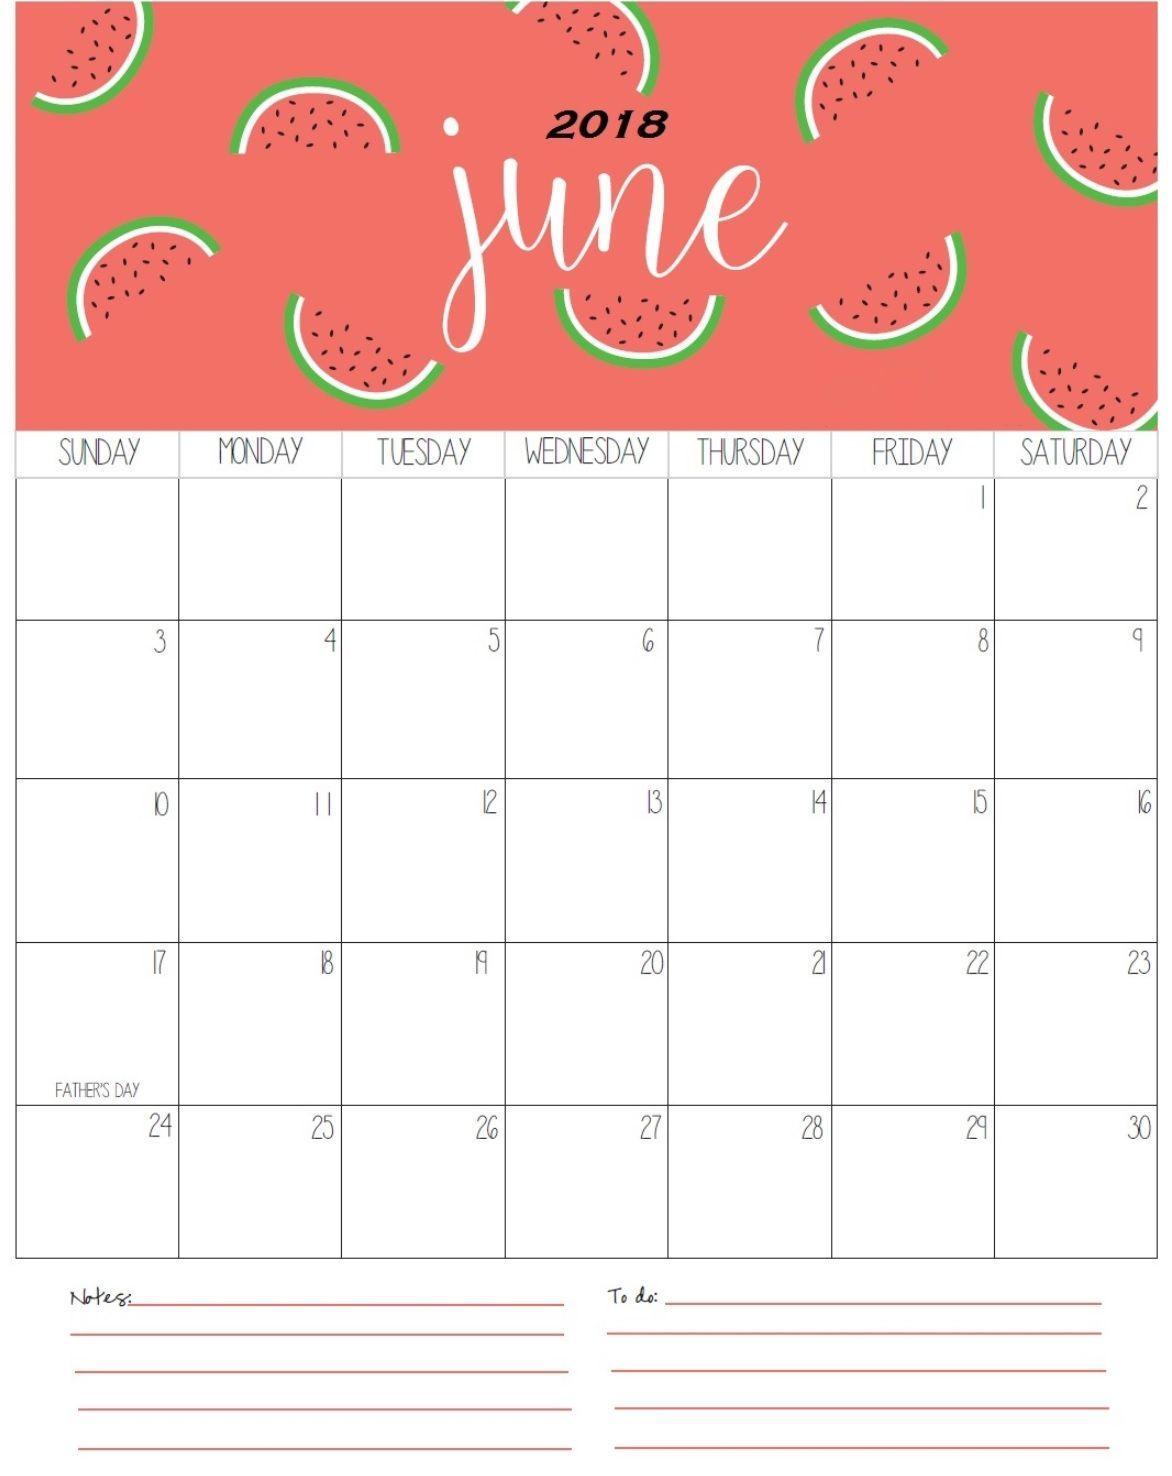 calendar 2018 with holidays printable